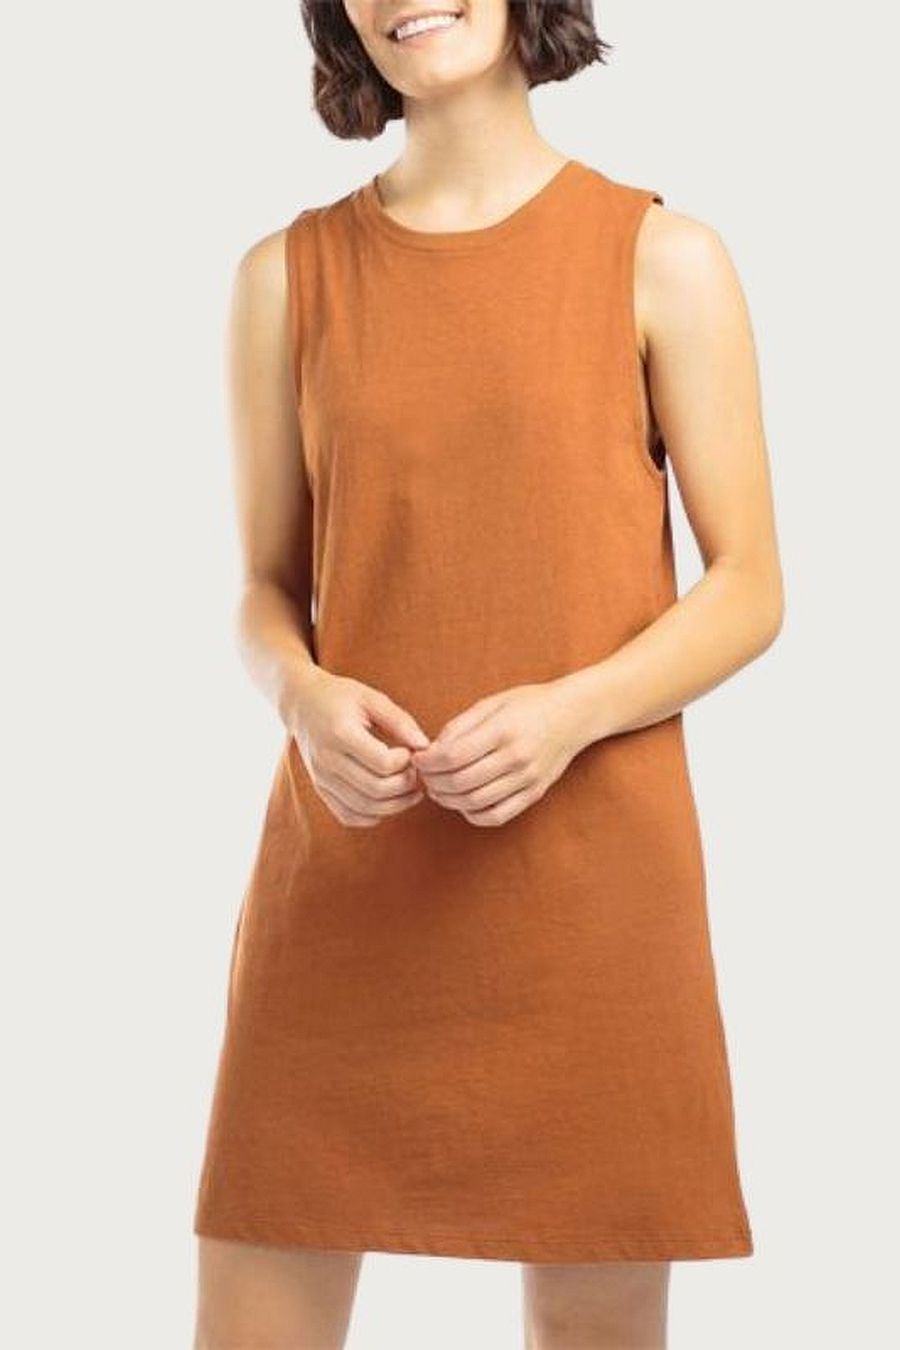 Richer Poorer Women's Tank Dress - Tobacco